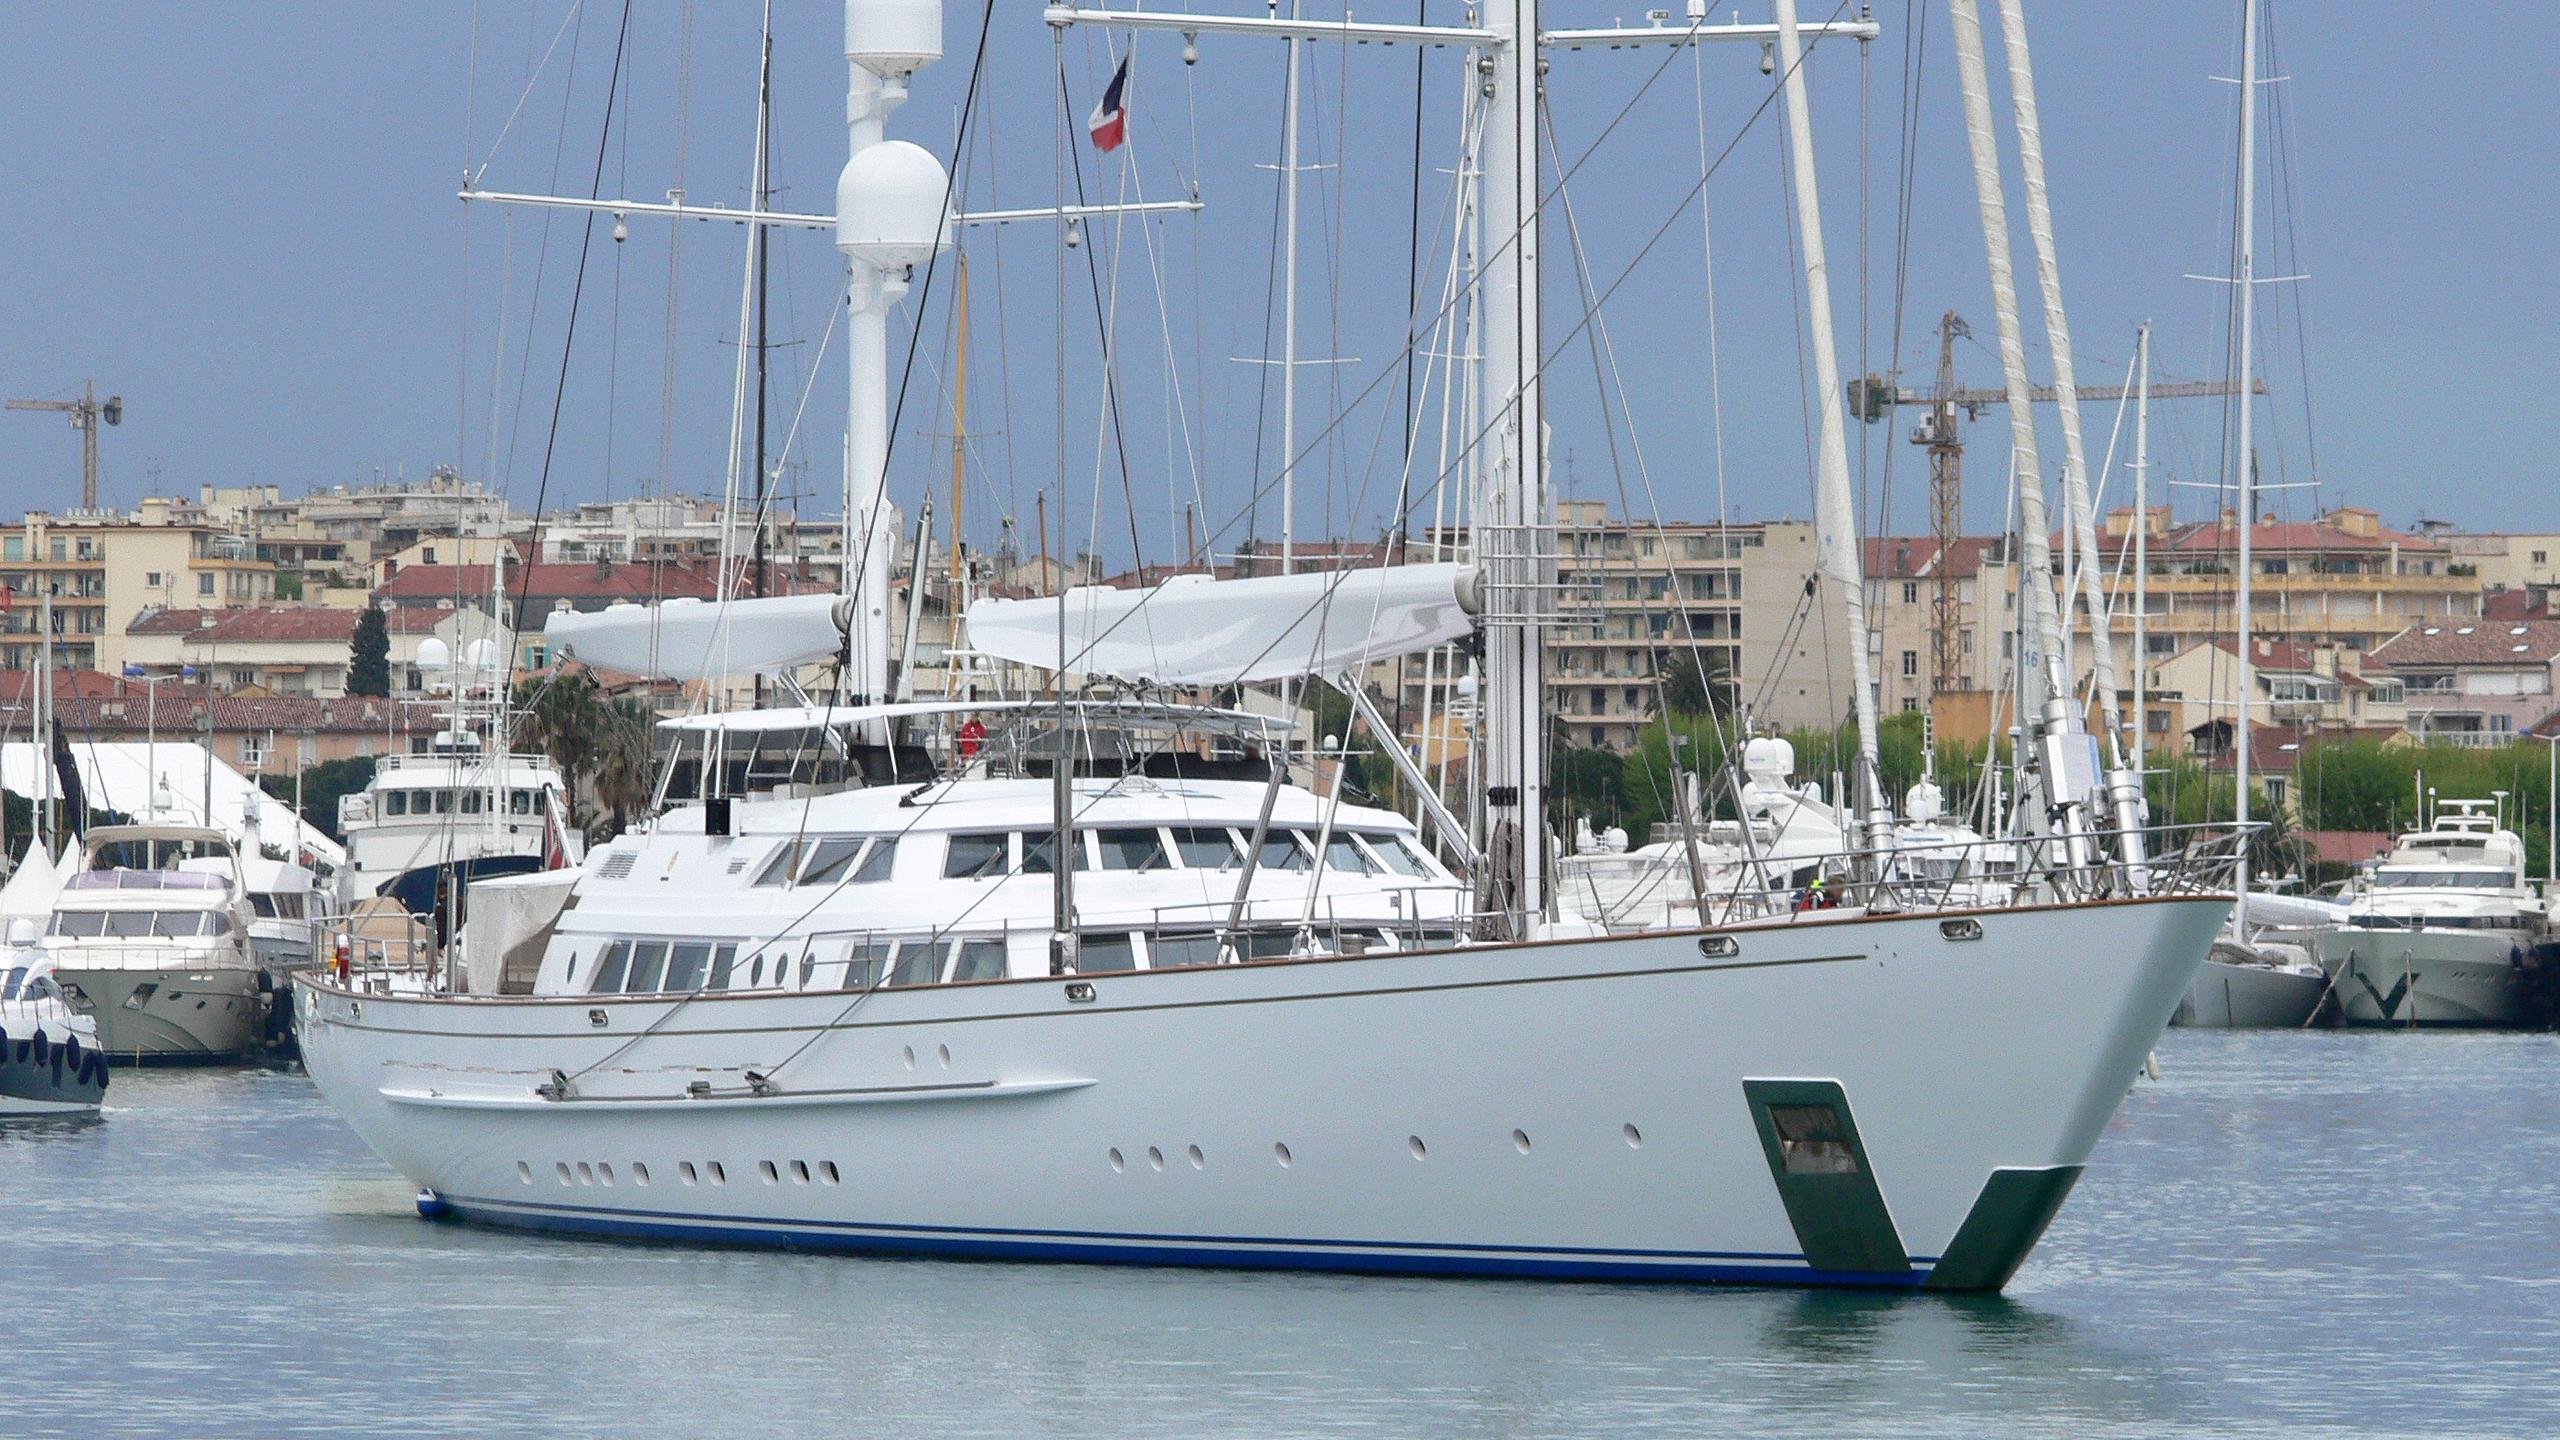 spirit-of-the-cs-sailing-yacht-perini-navi-2003-64m-moored-bow